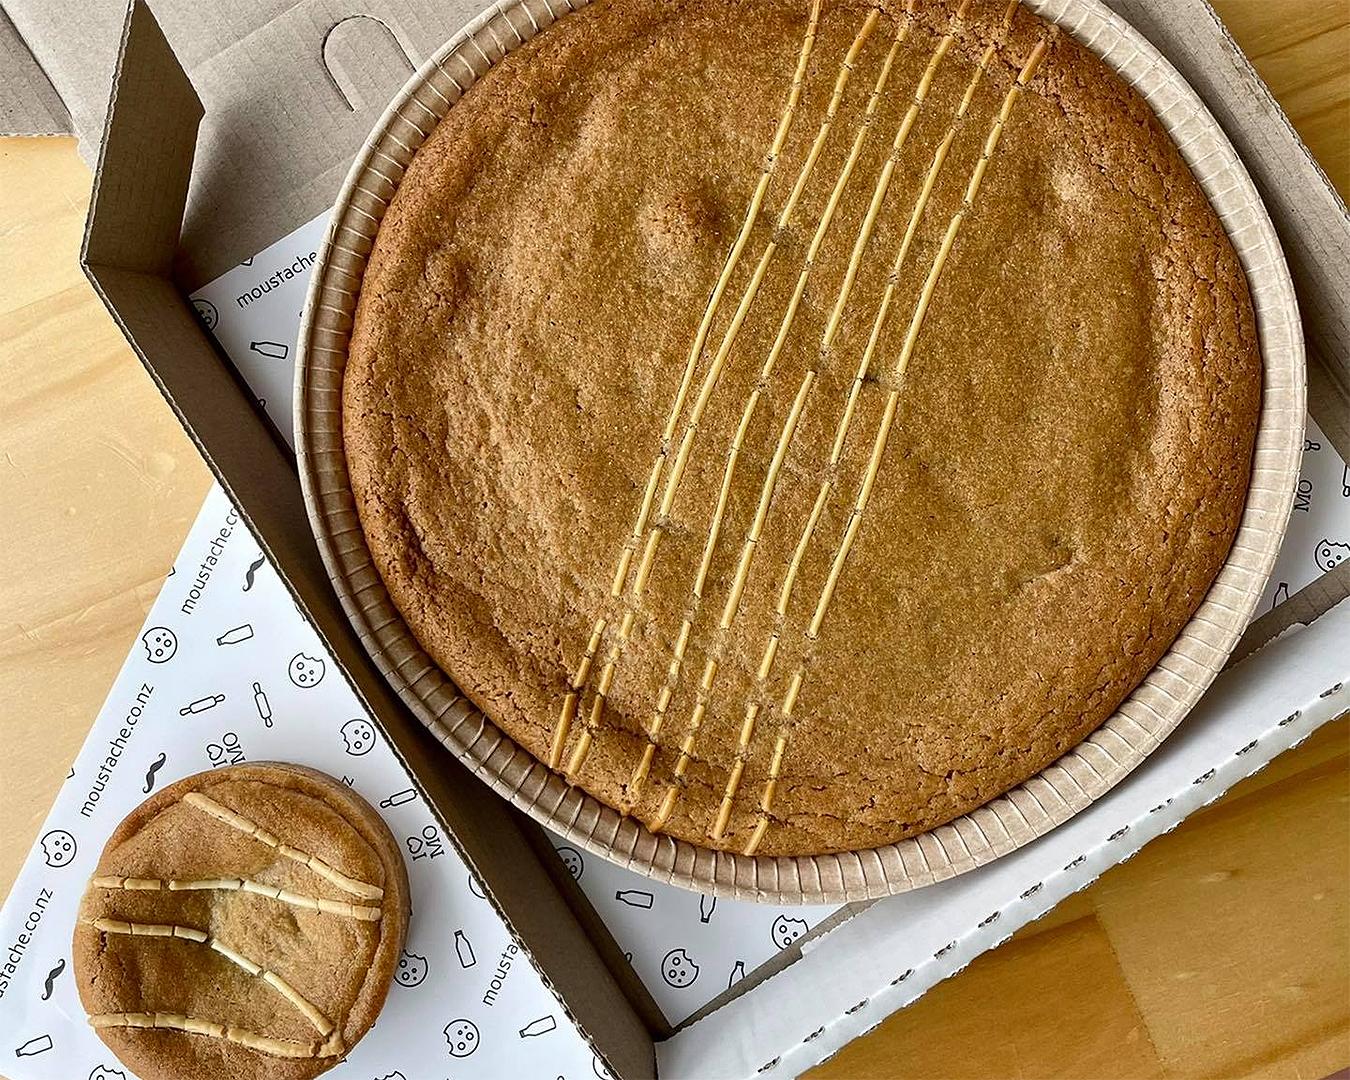 The massive Caramilk cookie pie cake alongside its regular cookie pie sized sibling.